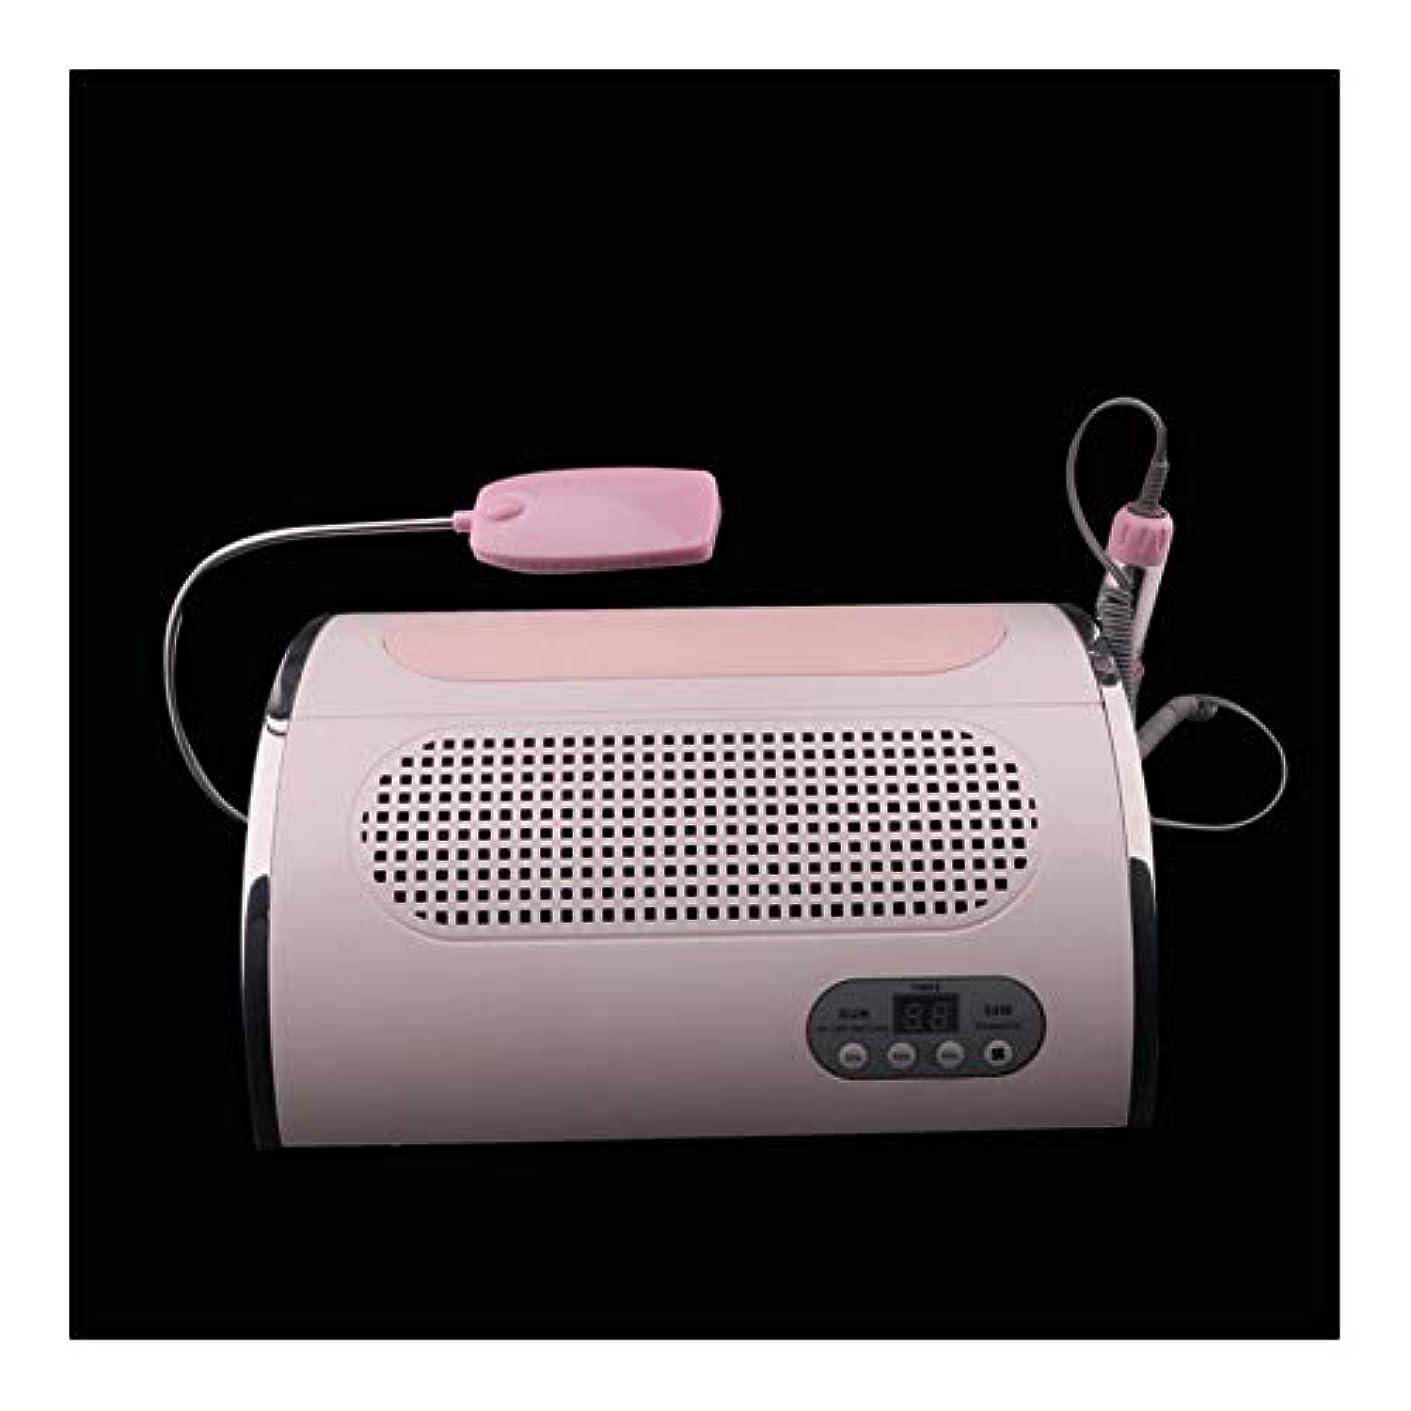 YESONEEP ネイル掃除機グラインダーネイルクリーナー54W LED光線療法ライト光線療法機械 (Size : 4 in 1)